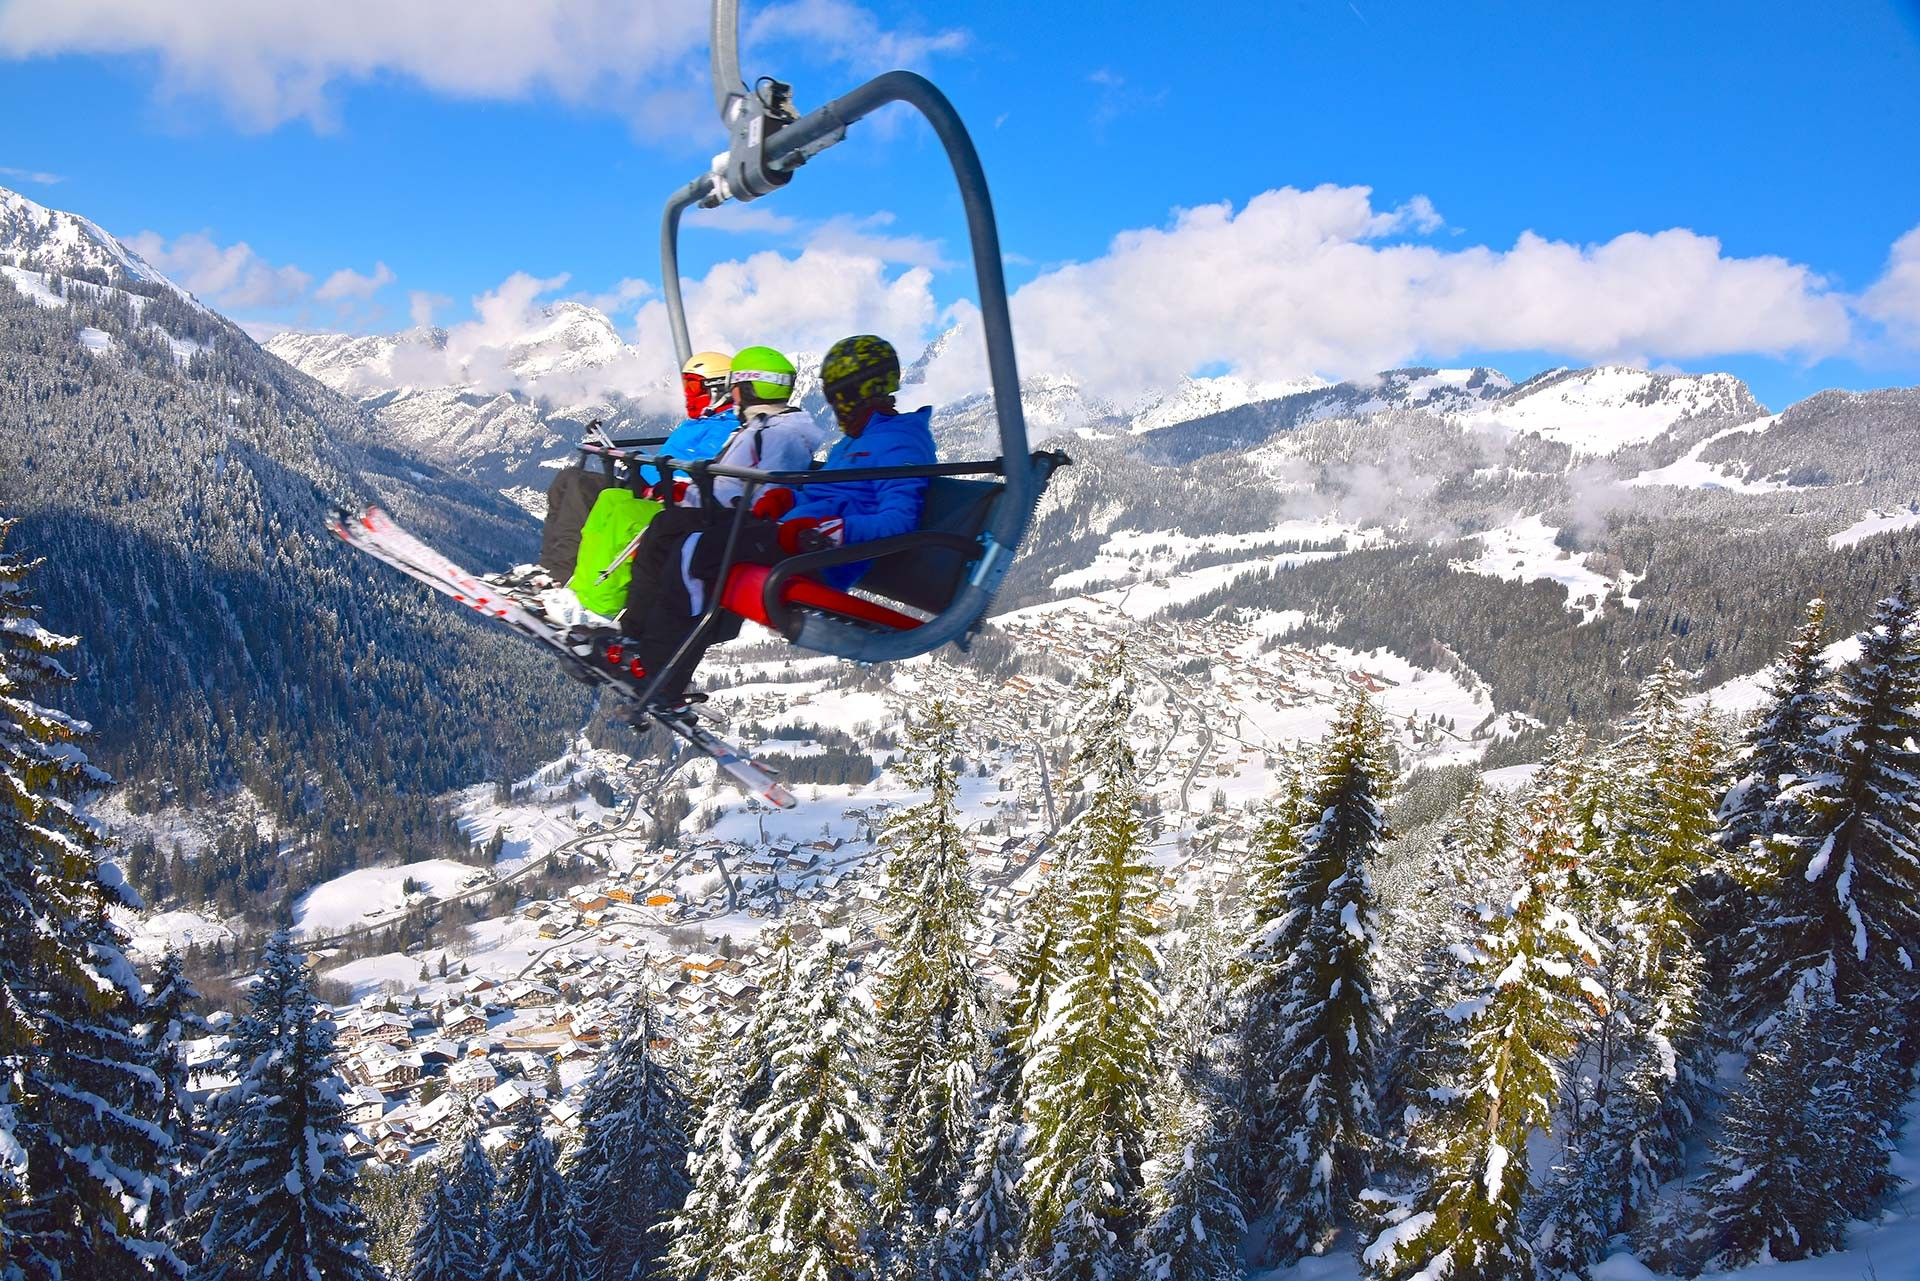 Ski passes prices